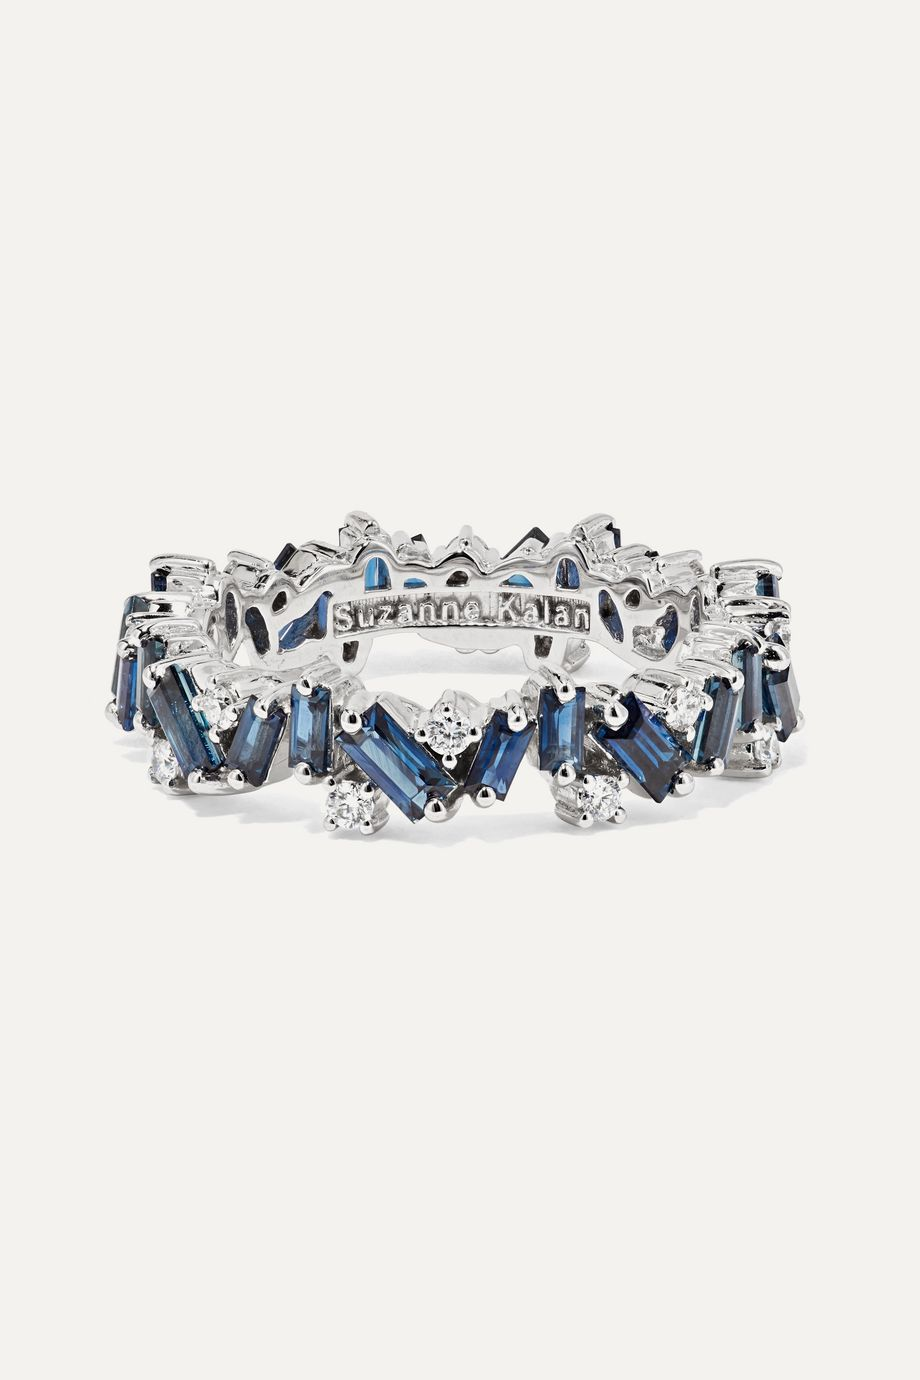 Suzanne Kalan 18-karat white gold, sapphire and diamond ring